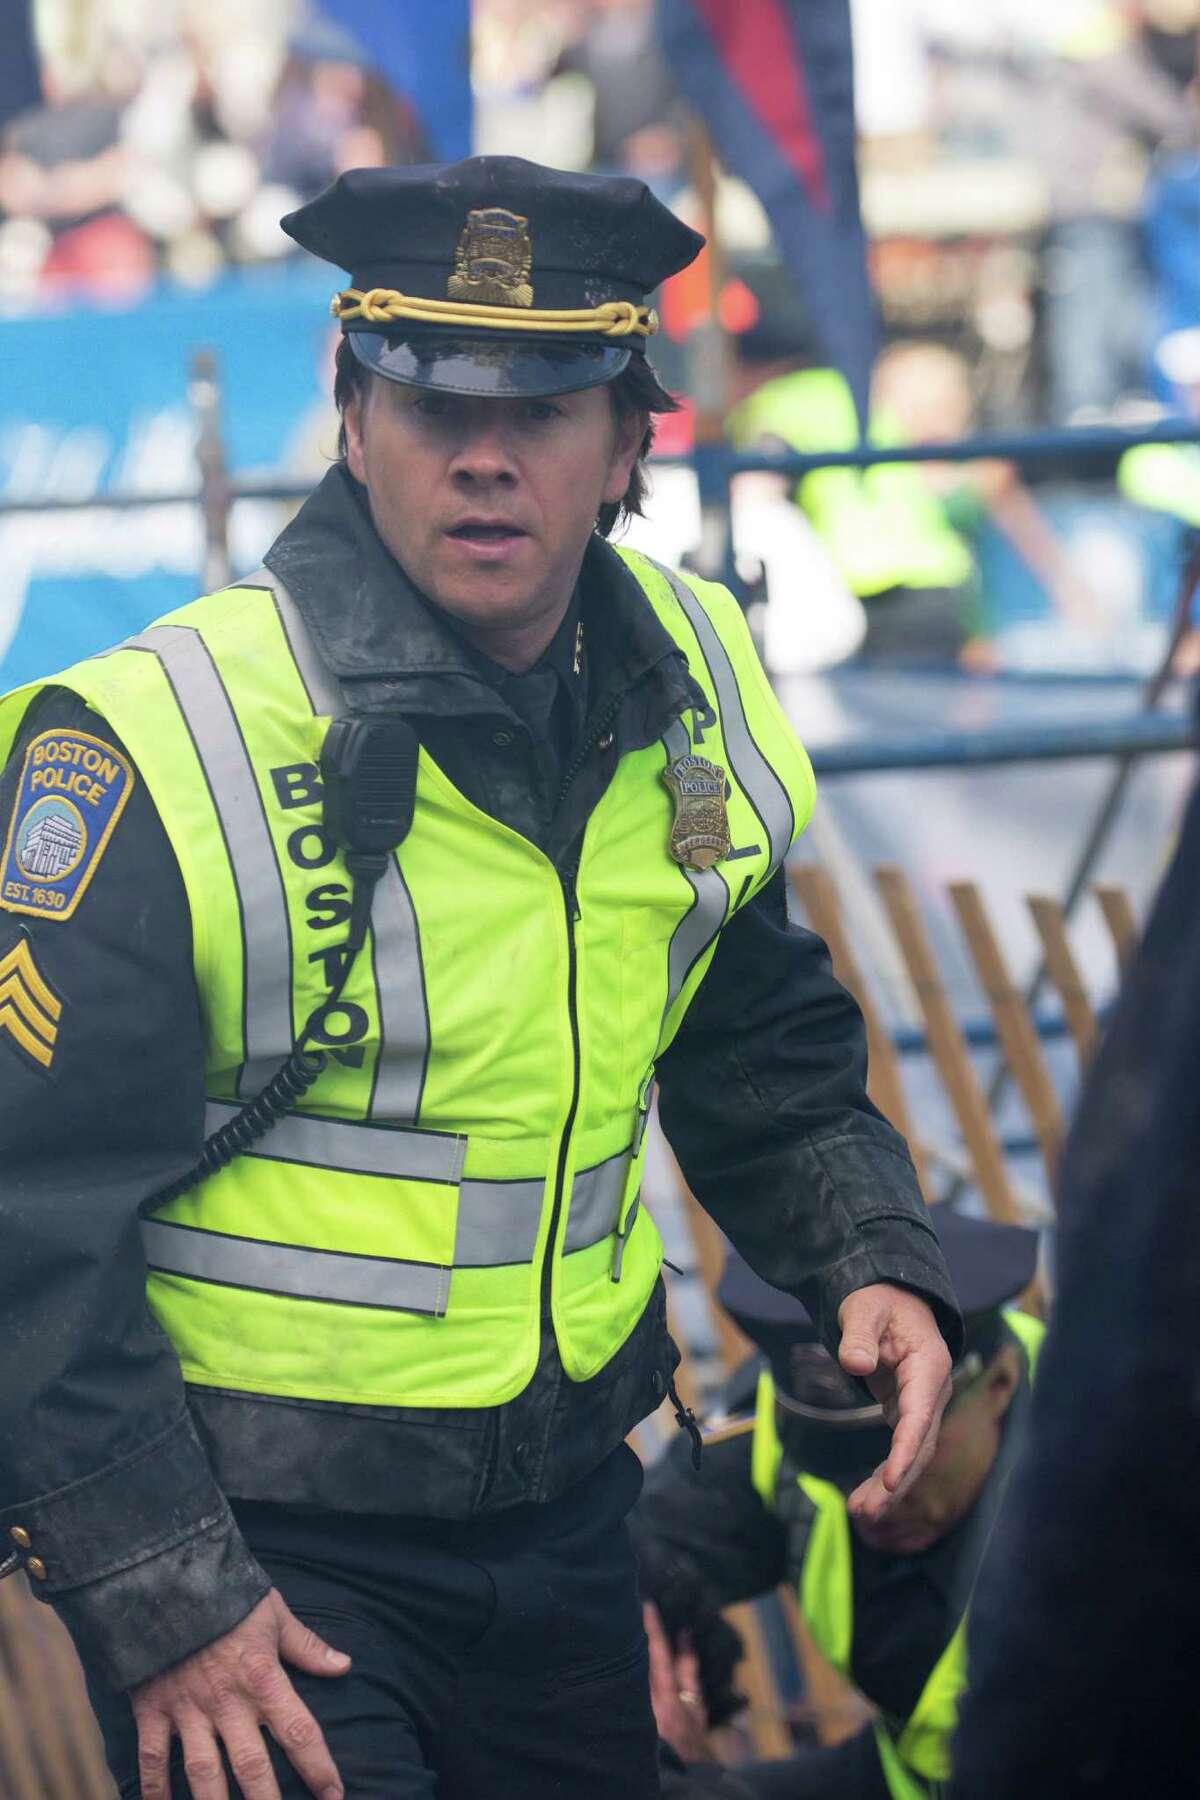 Celeb : Mark Wahlberg Claim to fame: Actor Super Bowl LI team: New England Patriots Source: Fox Sports